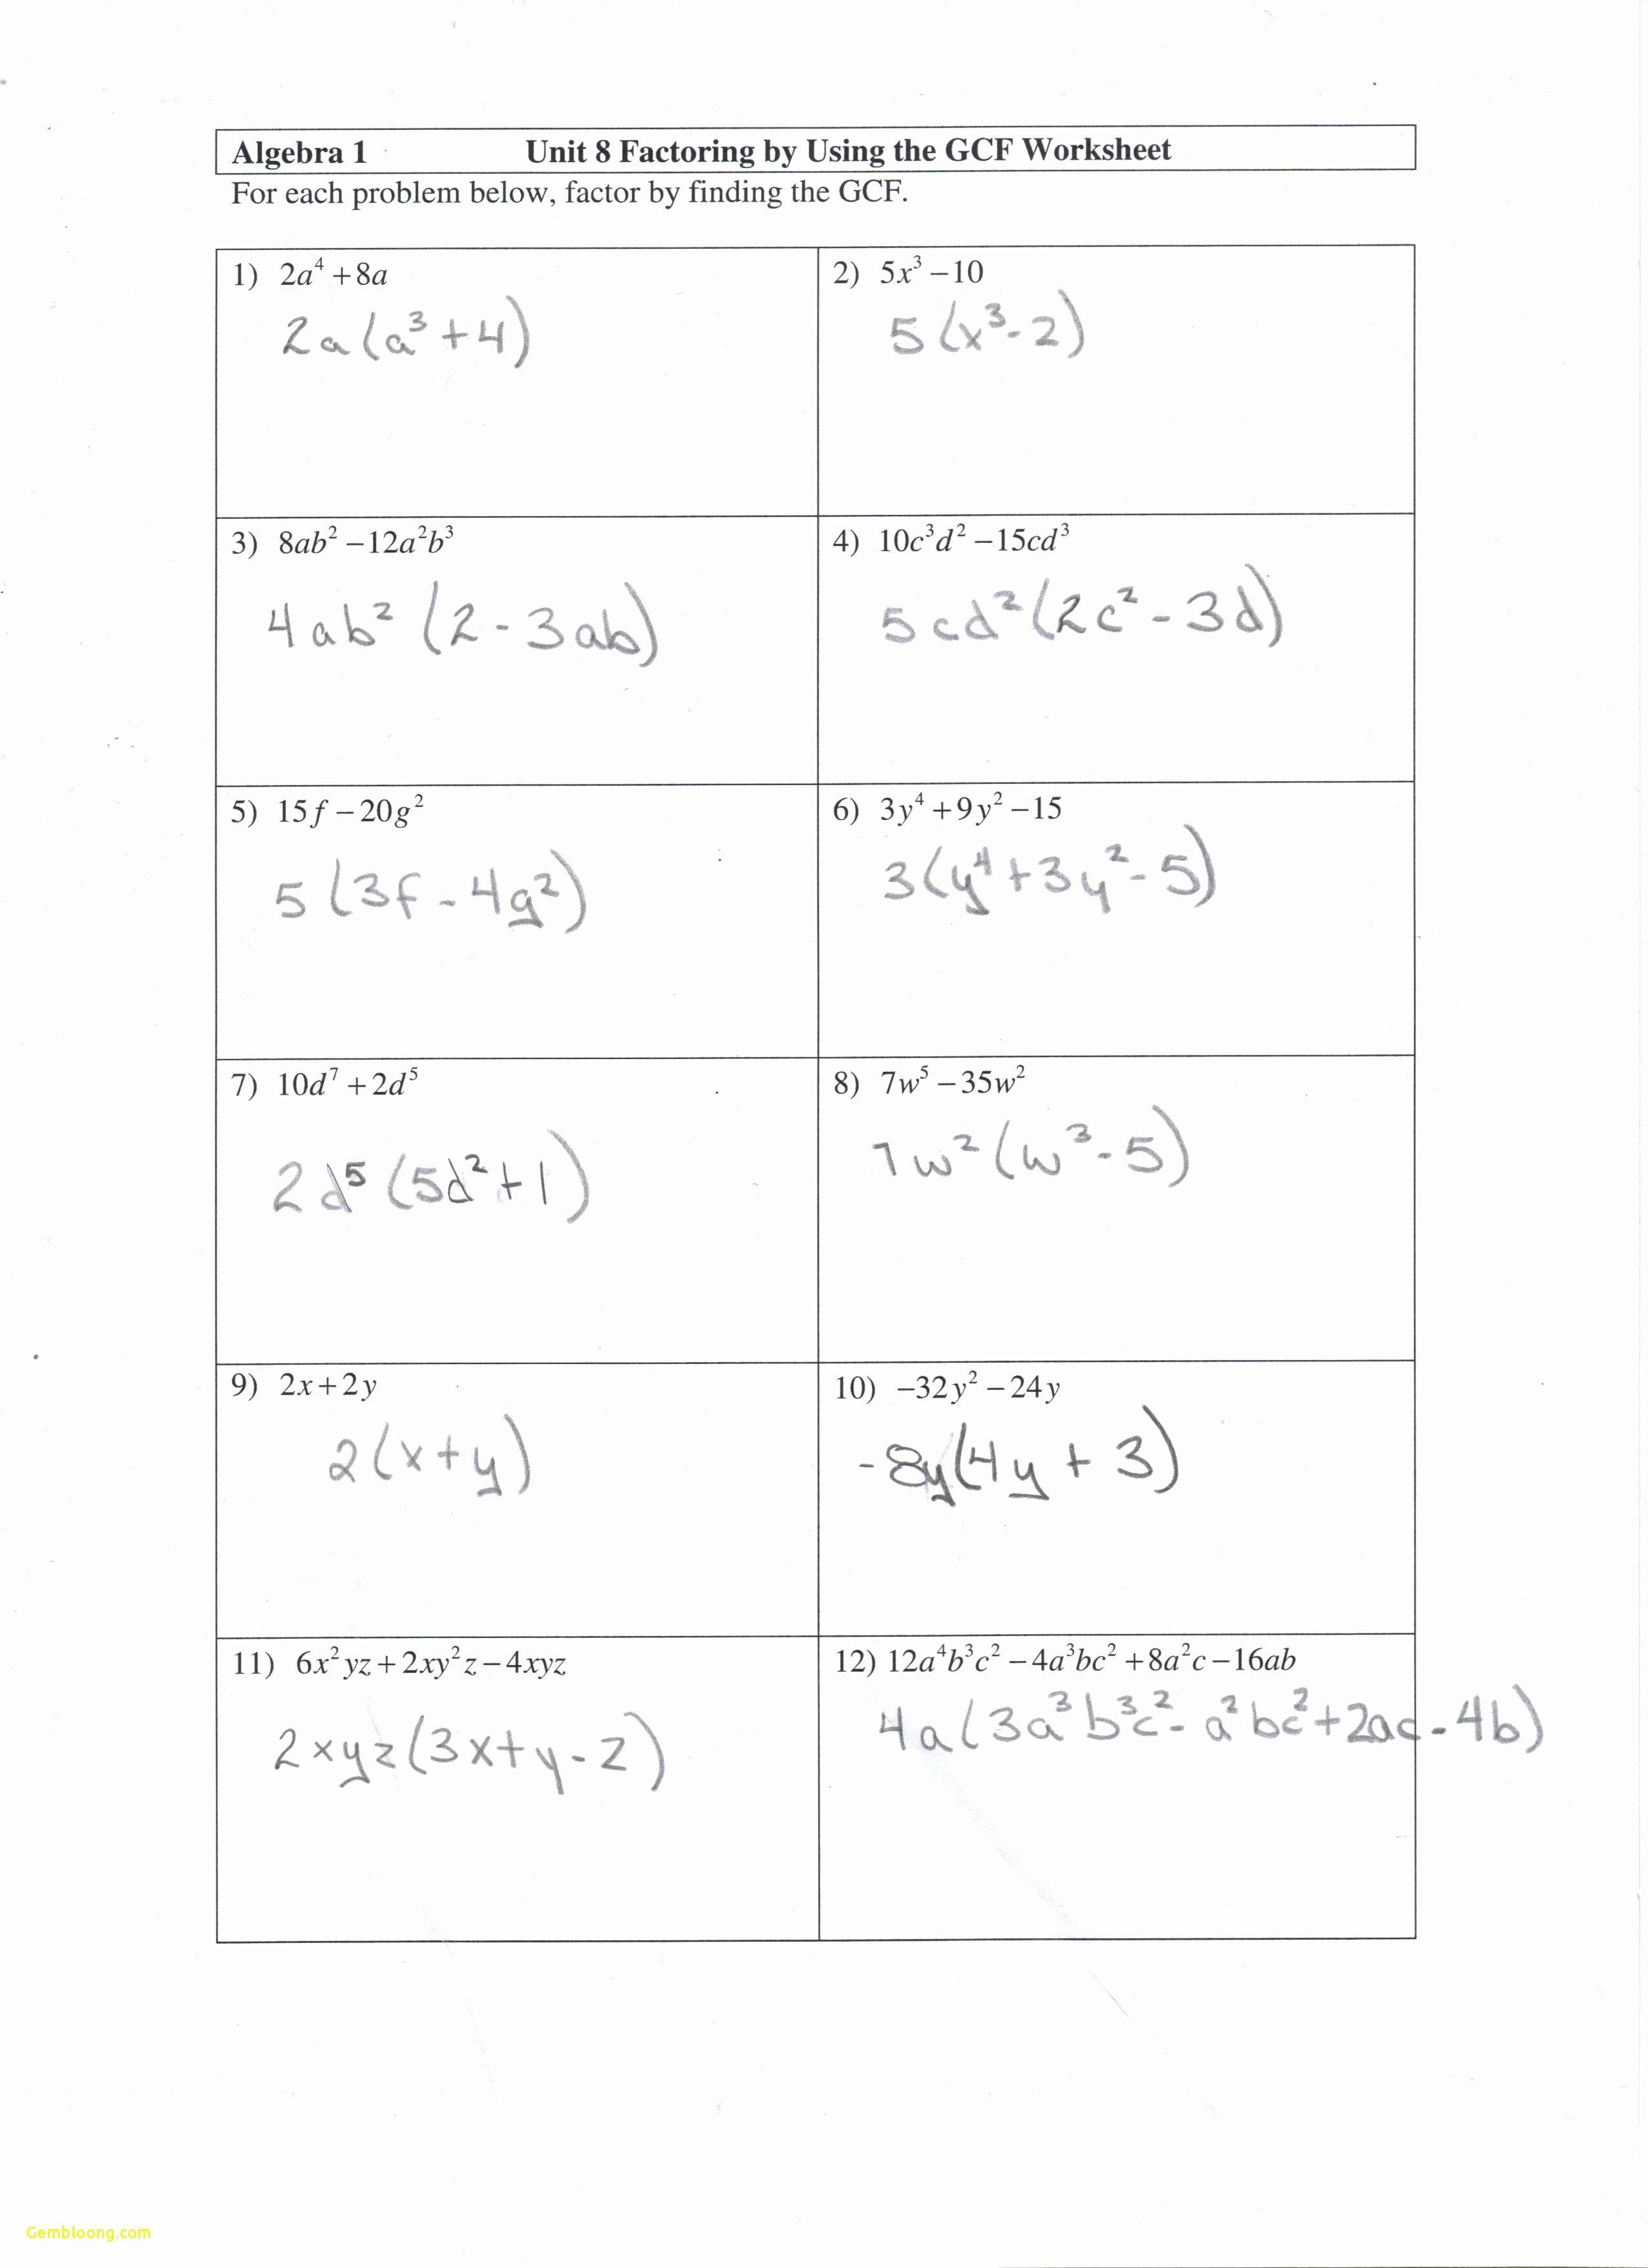 Algebra 2 Factoring Worksheet Unique Factoring Quadratics Worksheet Cramerforcongress